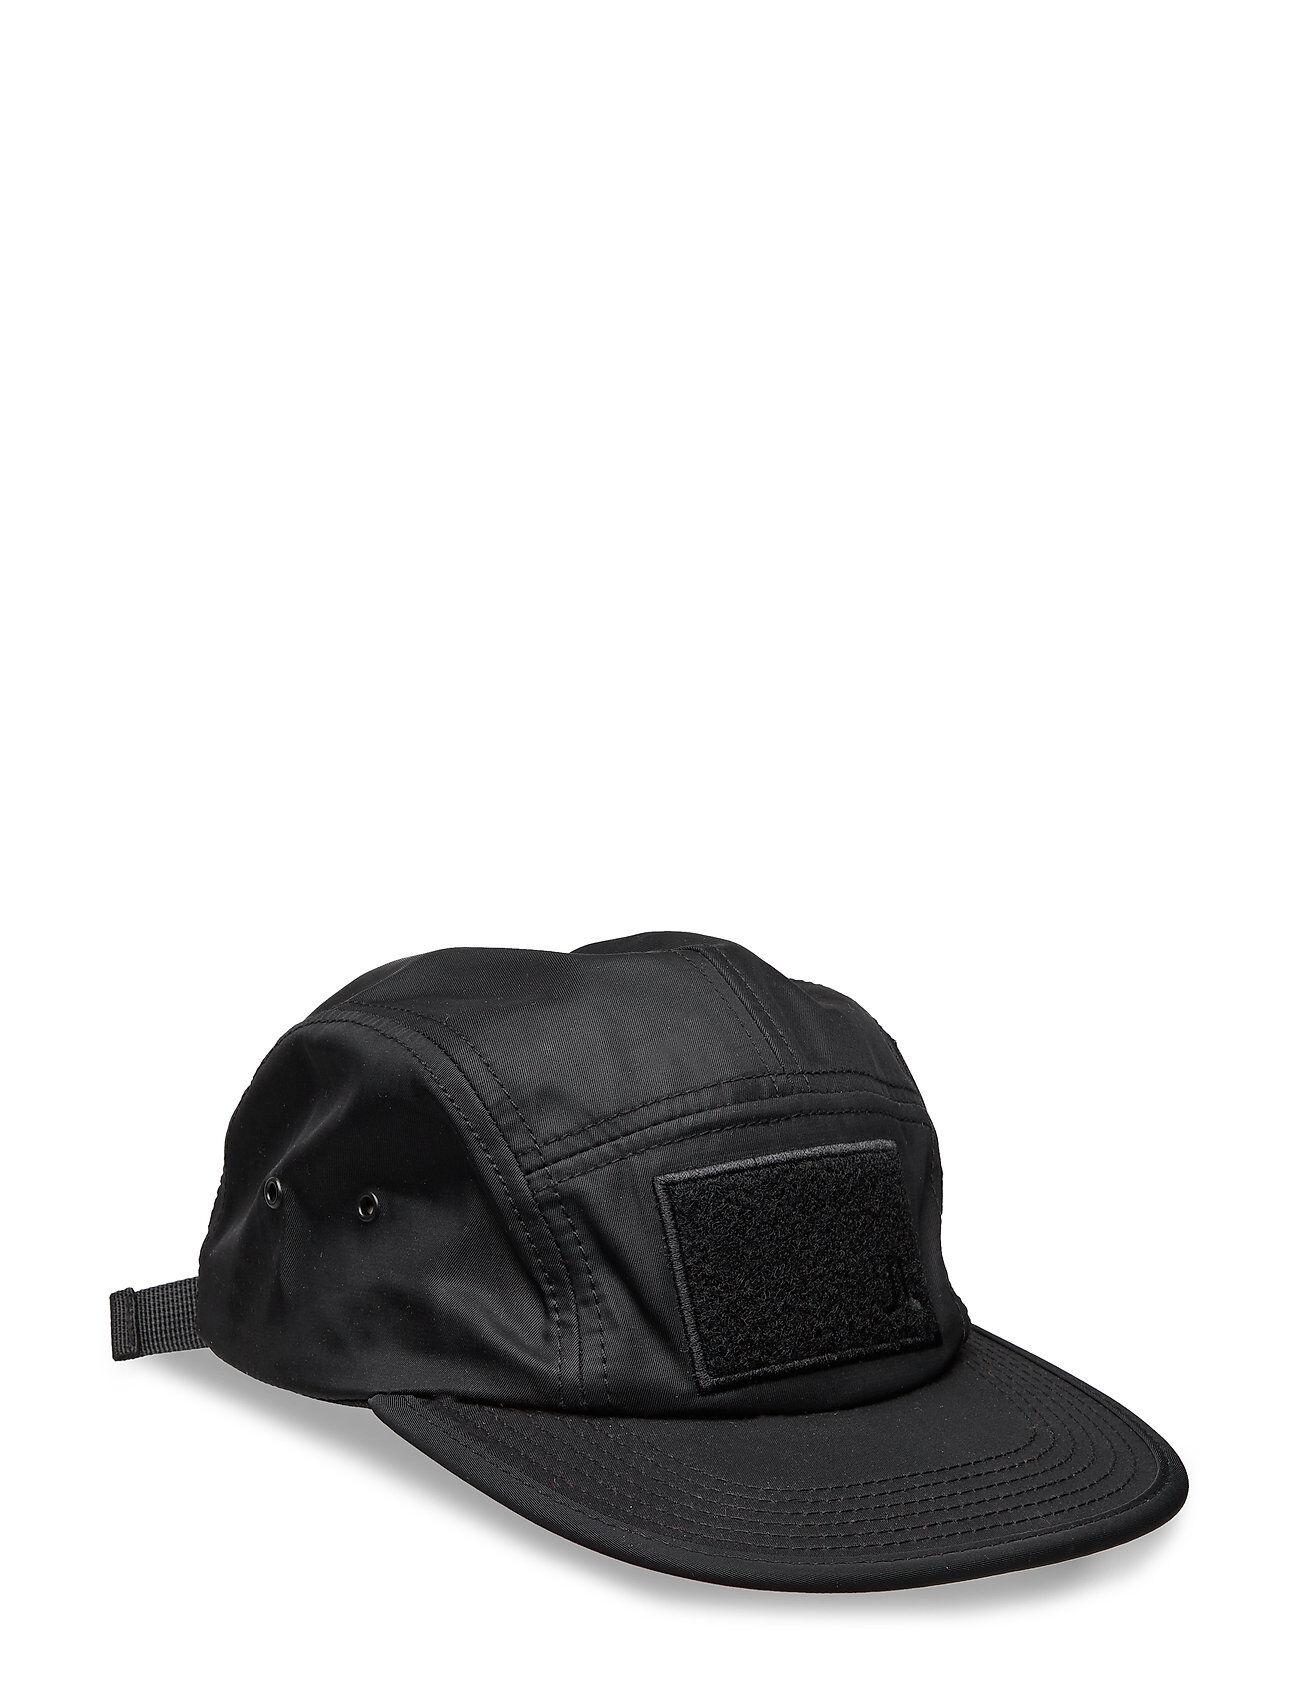 WeSC Soft Velcro 5 Panel Cap Accessories Headwear Caps Musta WeSC